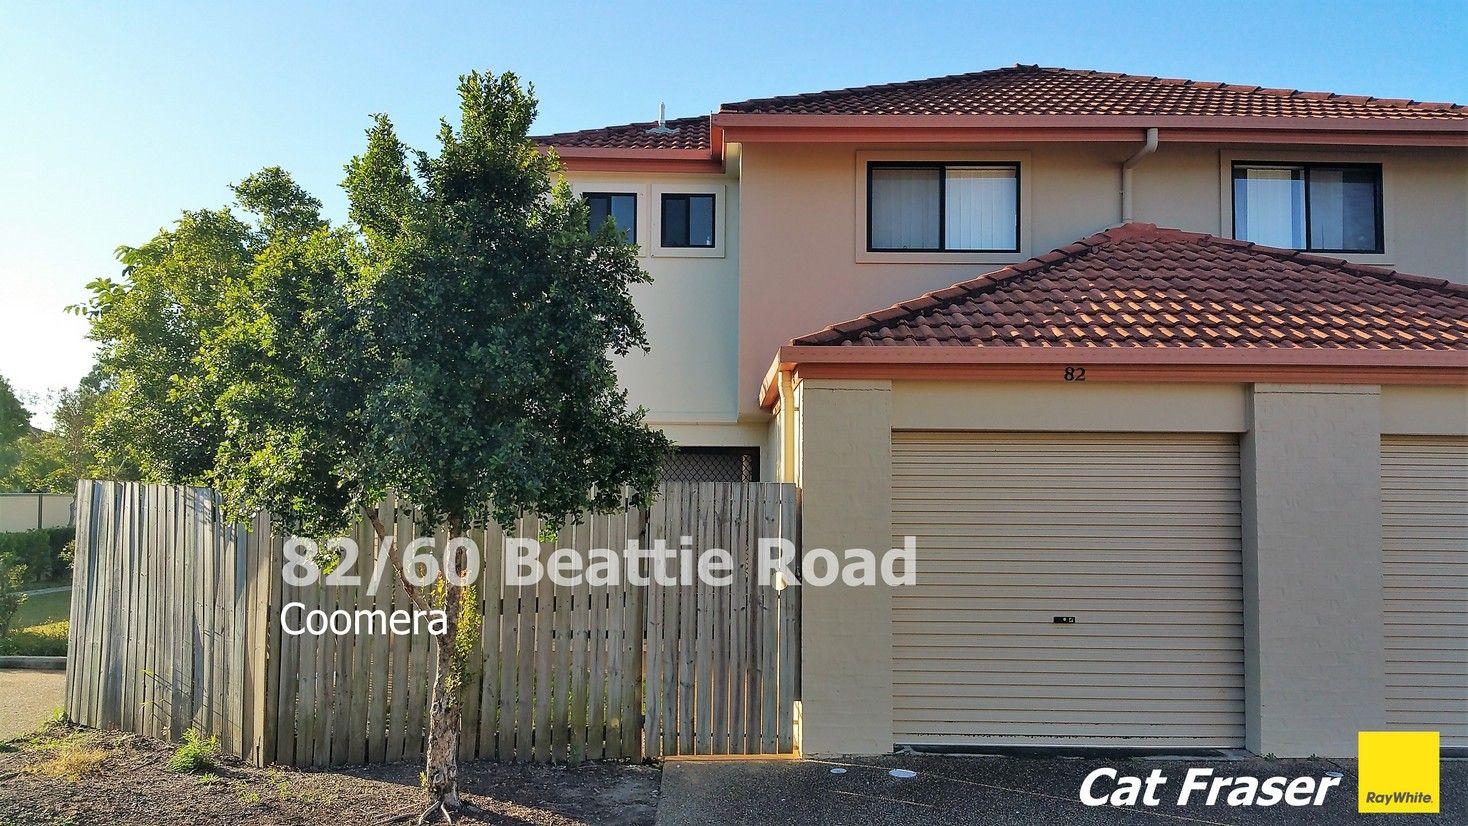 82/60 Beattie Road, Coomera QLD 4209, Image 0